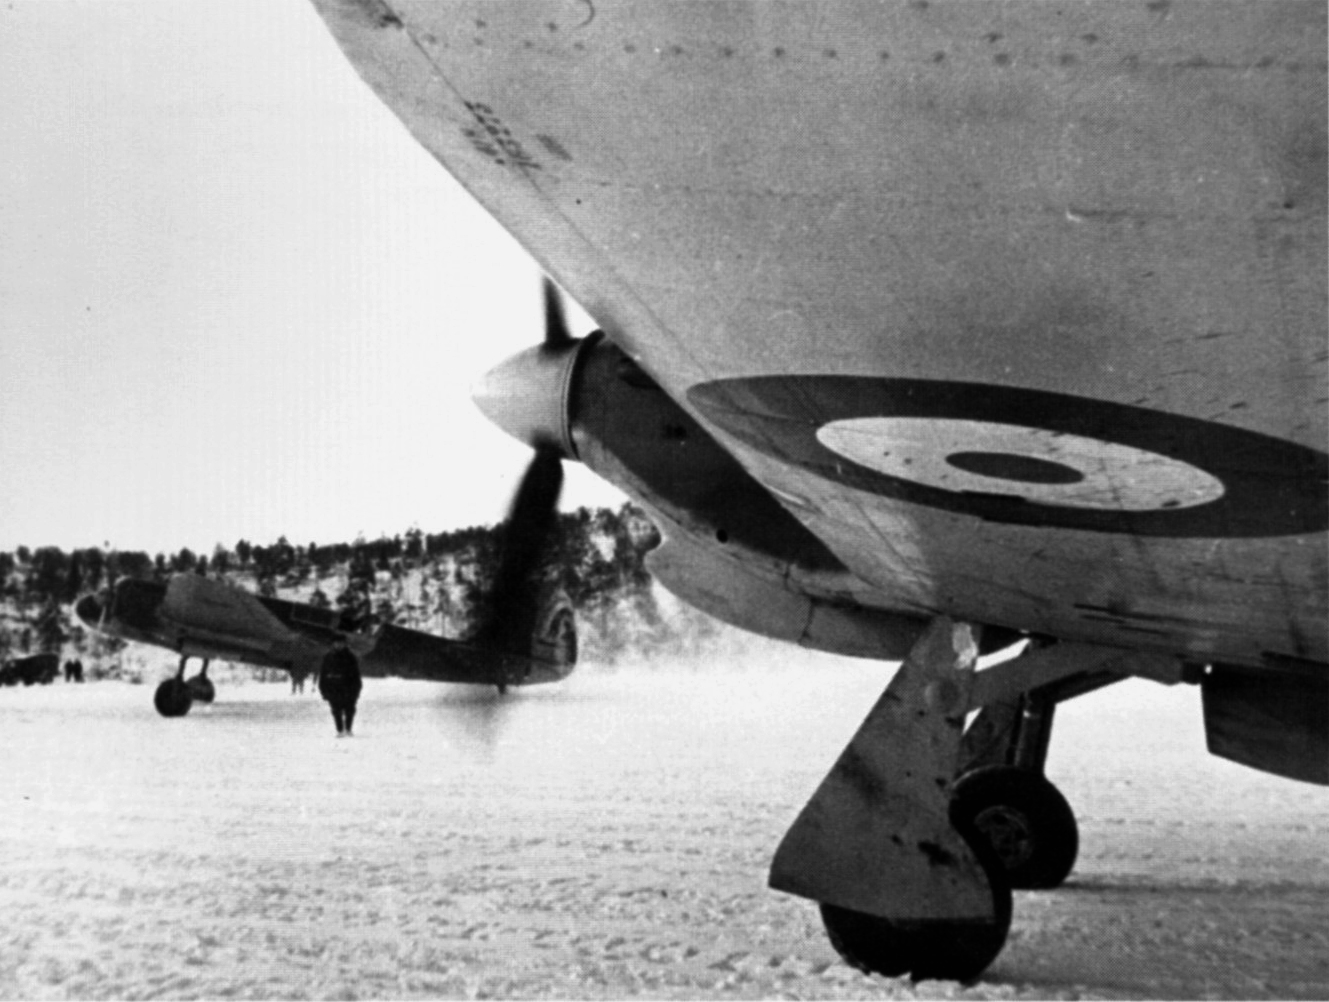 Hurricane IIb Trop RAF 151 Wing awaiting take off clearance Murmansk USSR winter 1941 01